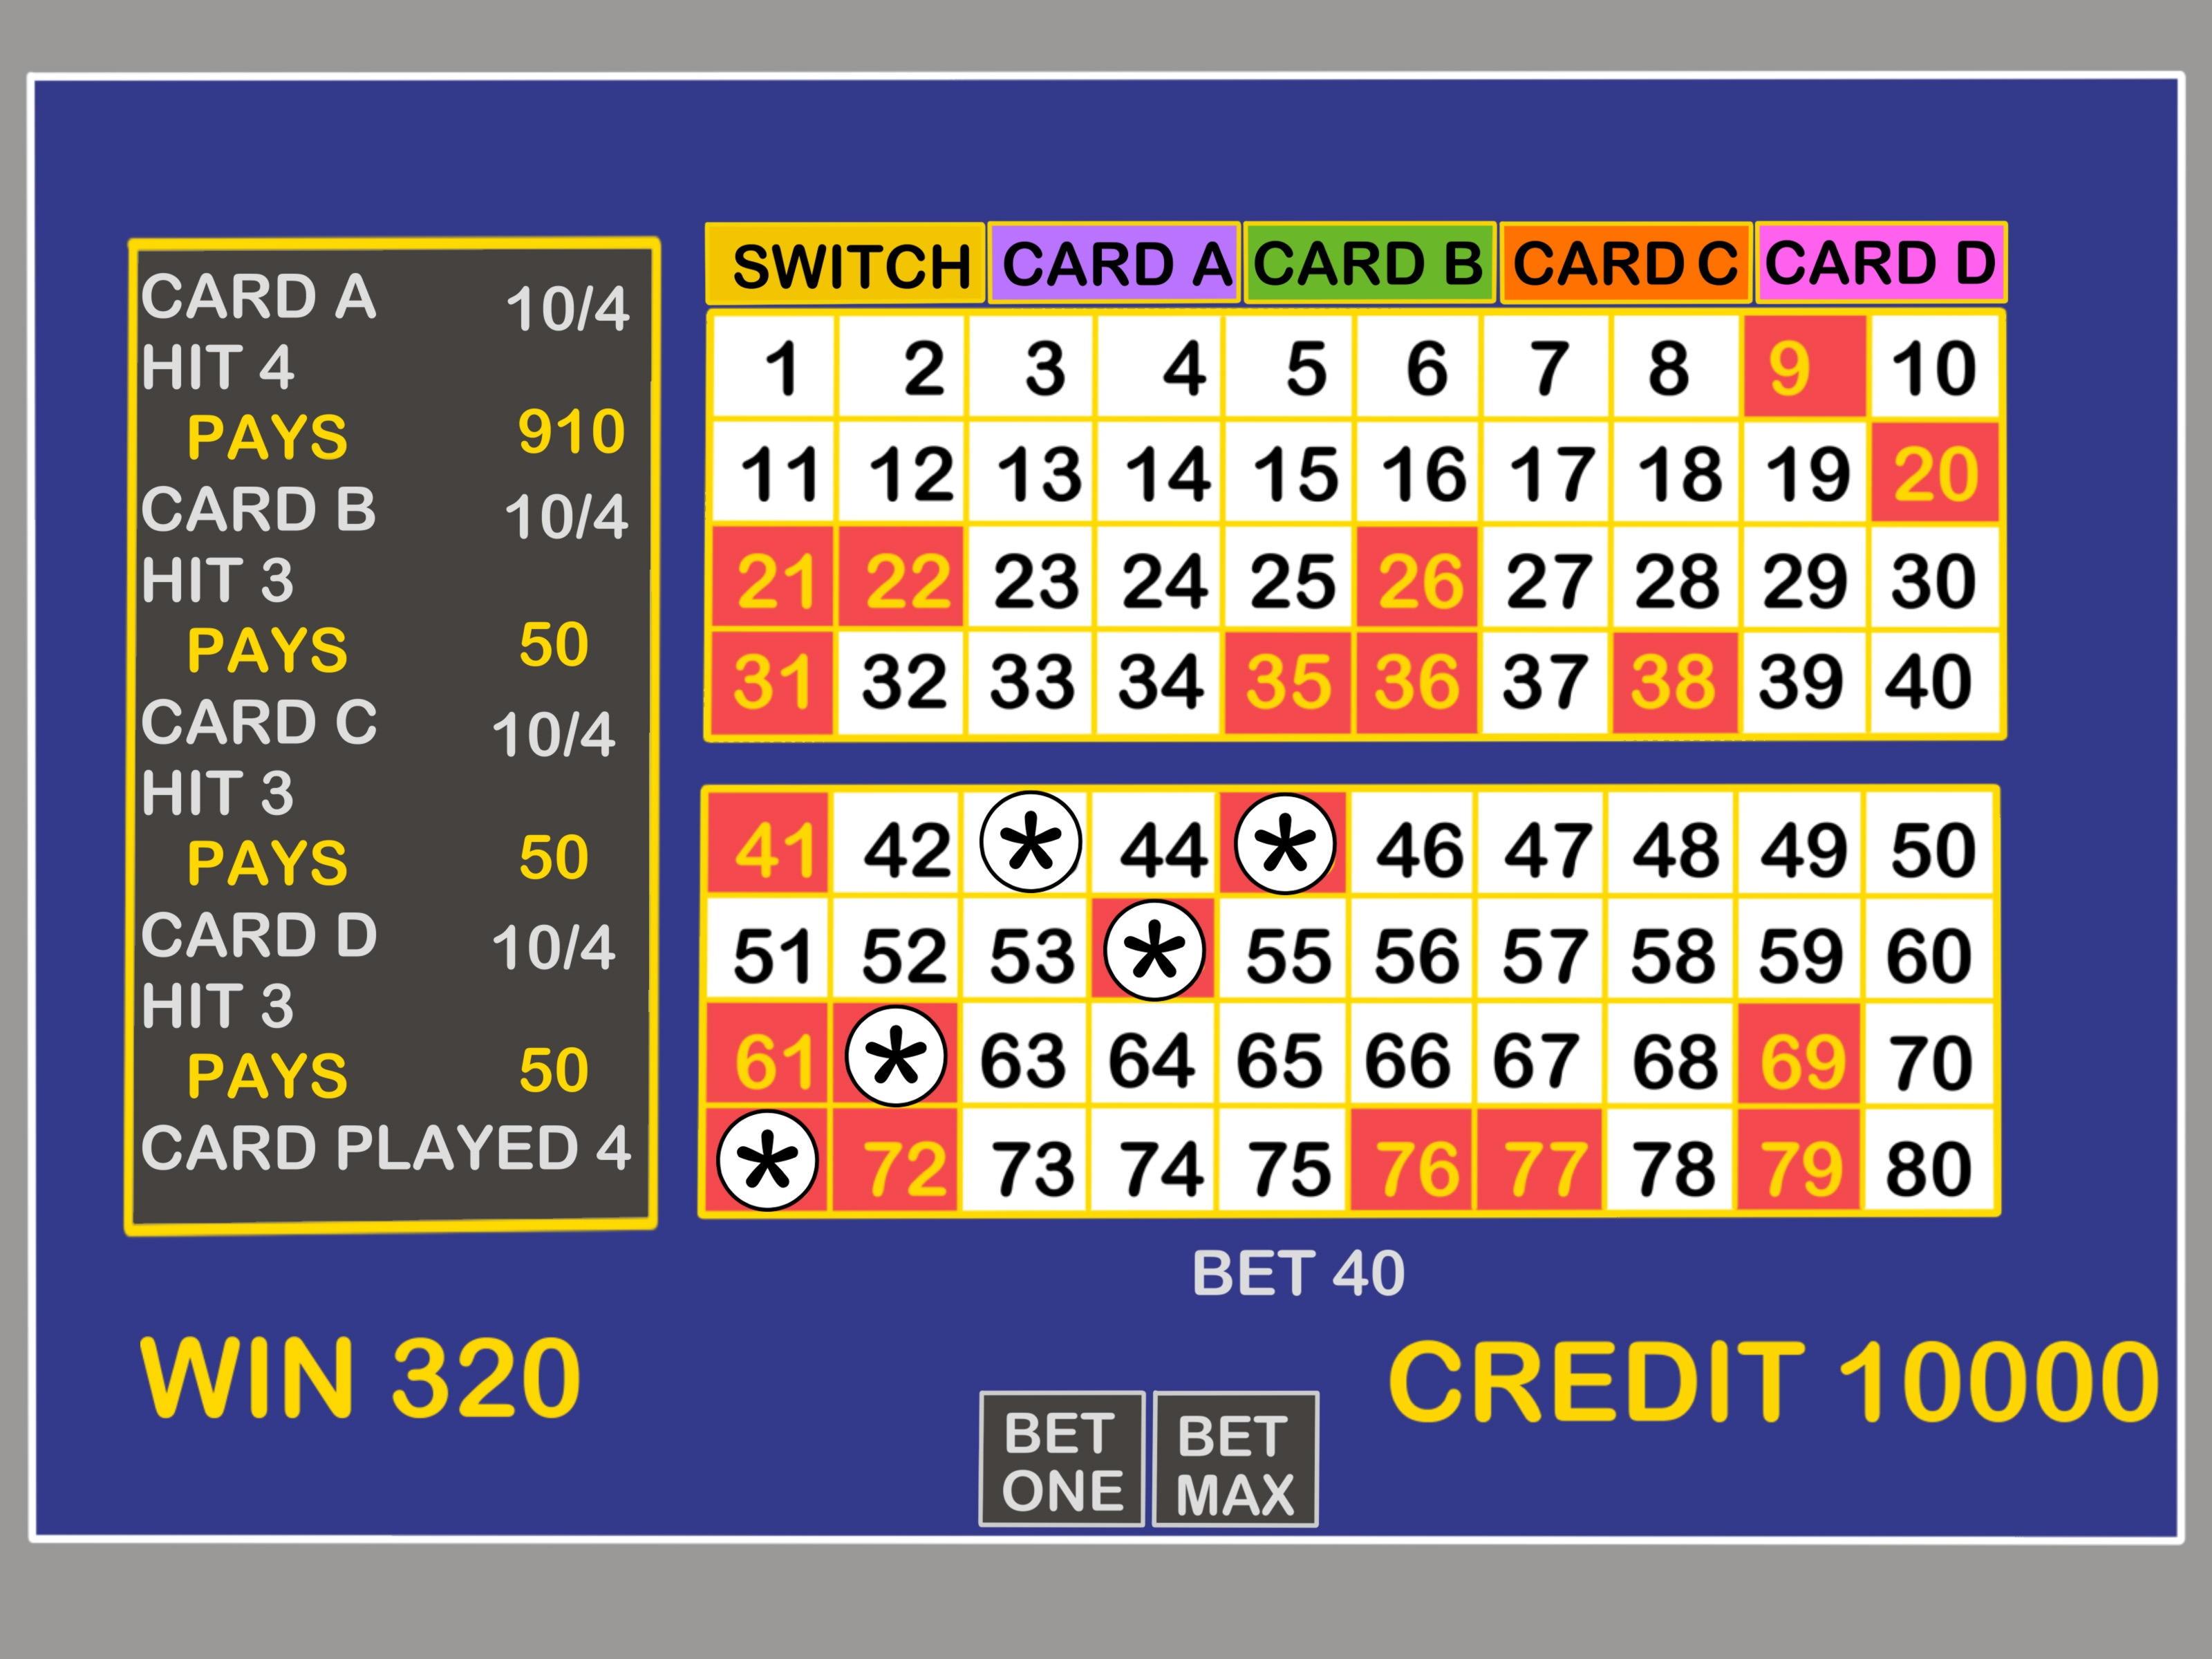 EUR 2310 no deposit bonus code at Gratorama Casino